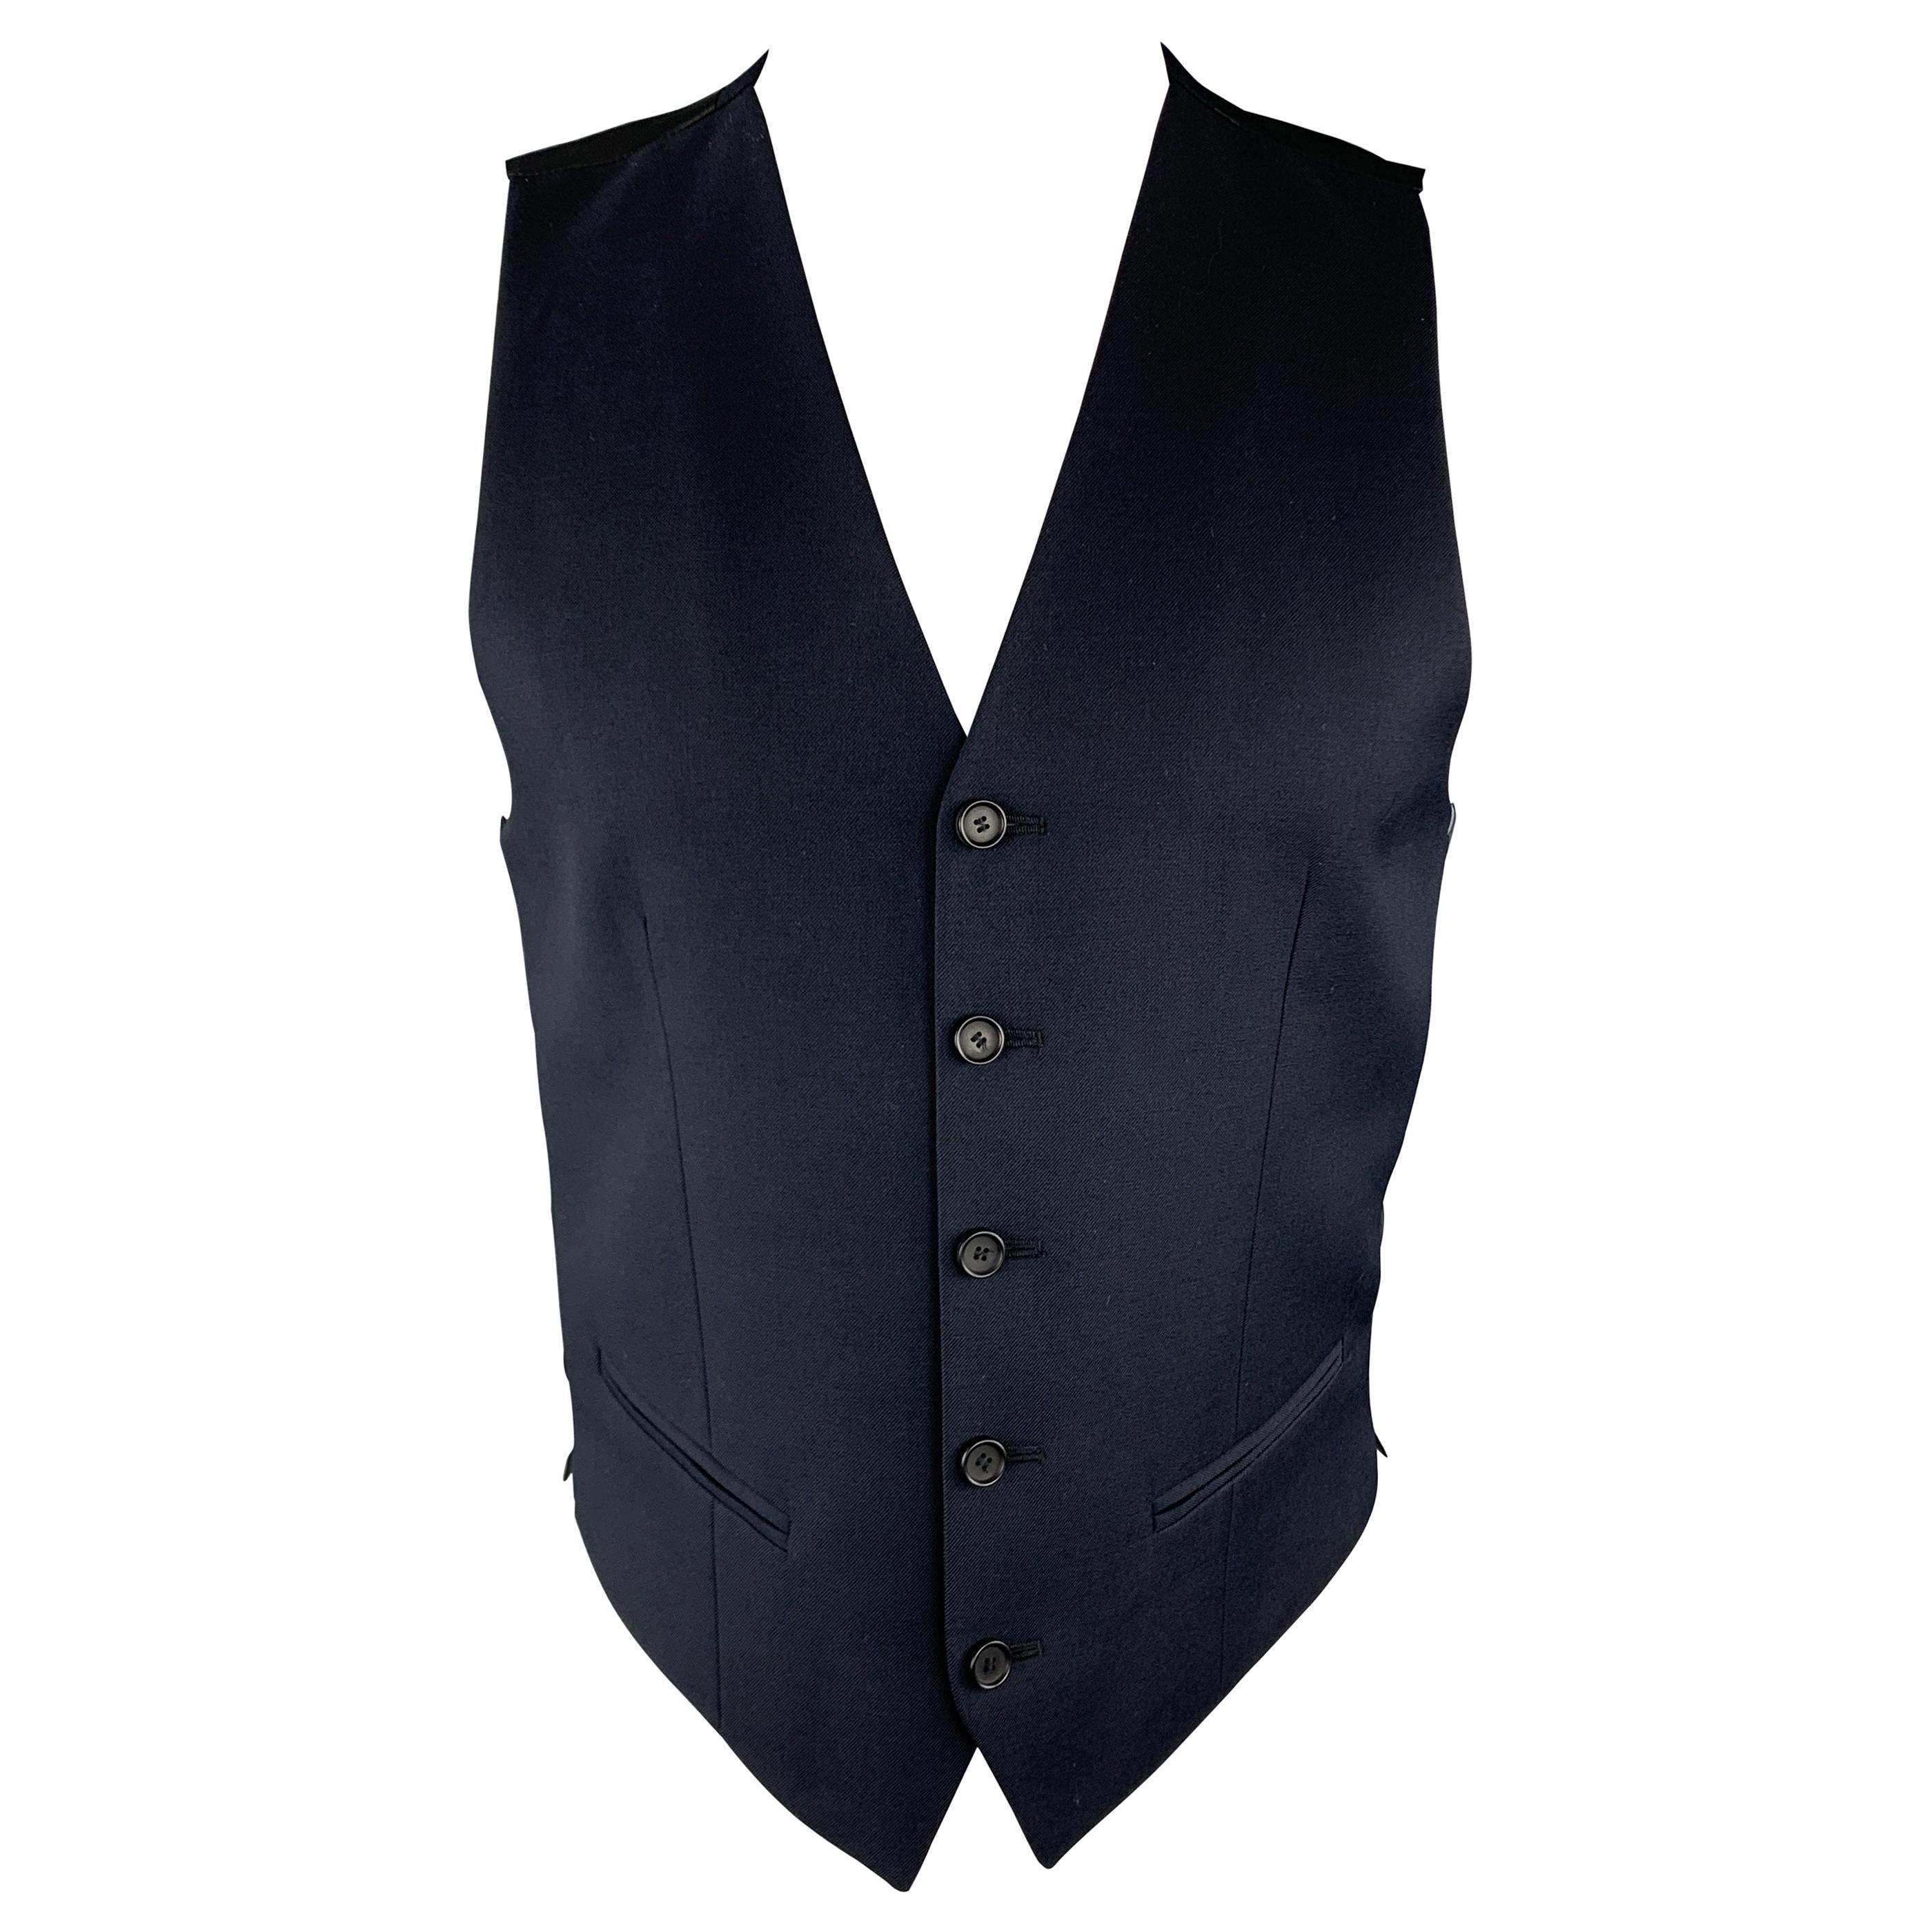 THE KOOPLES Size 36 Navy & Black Wool Buttoned Vest